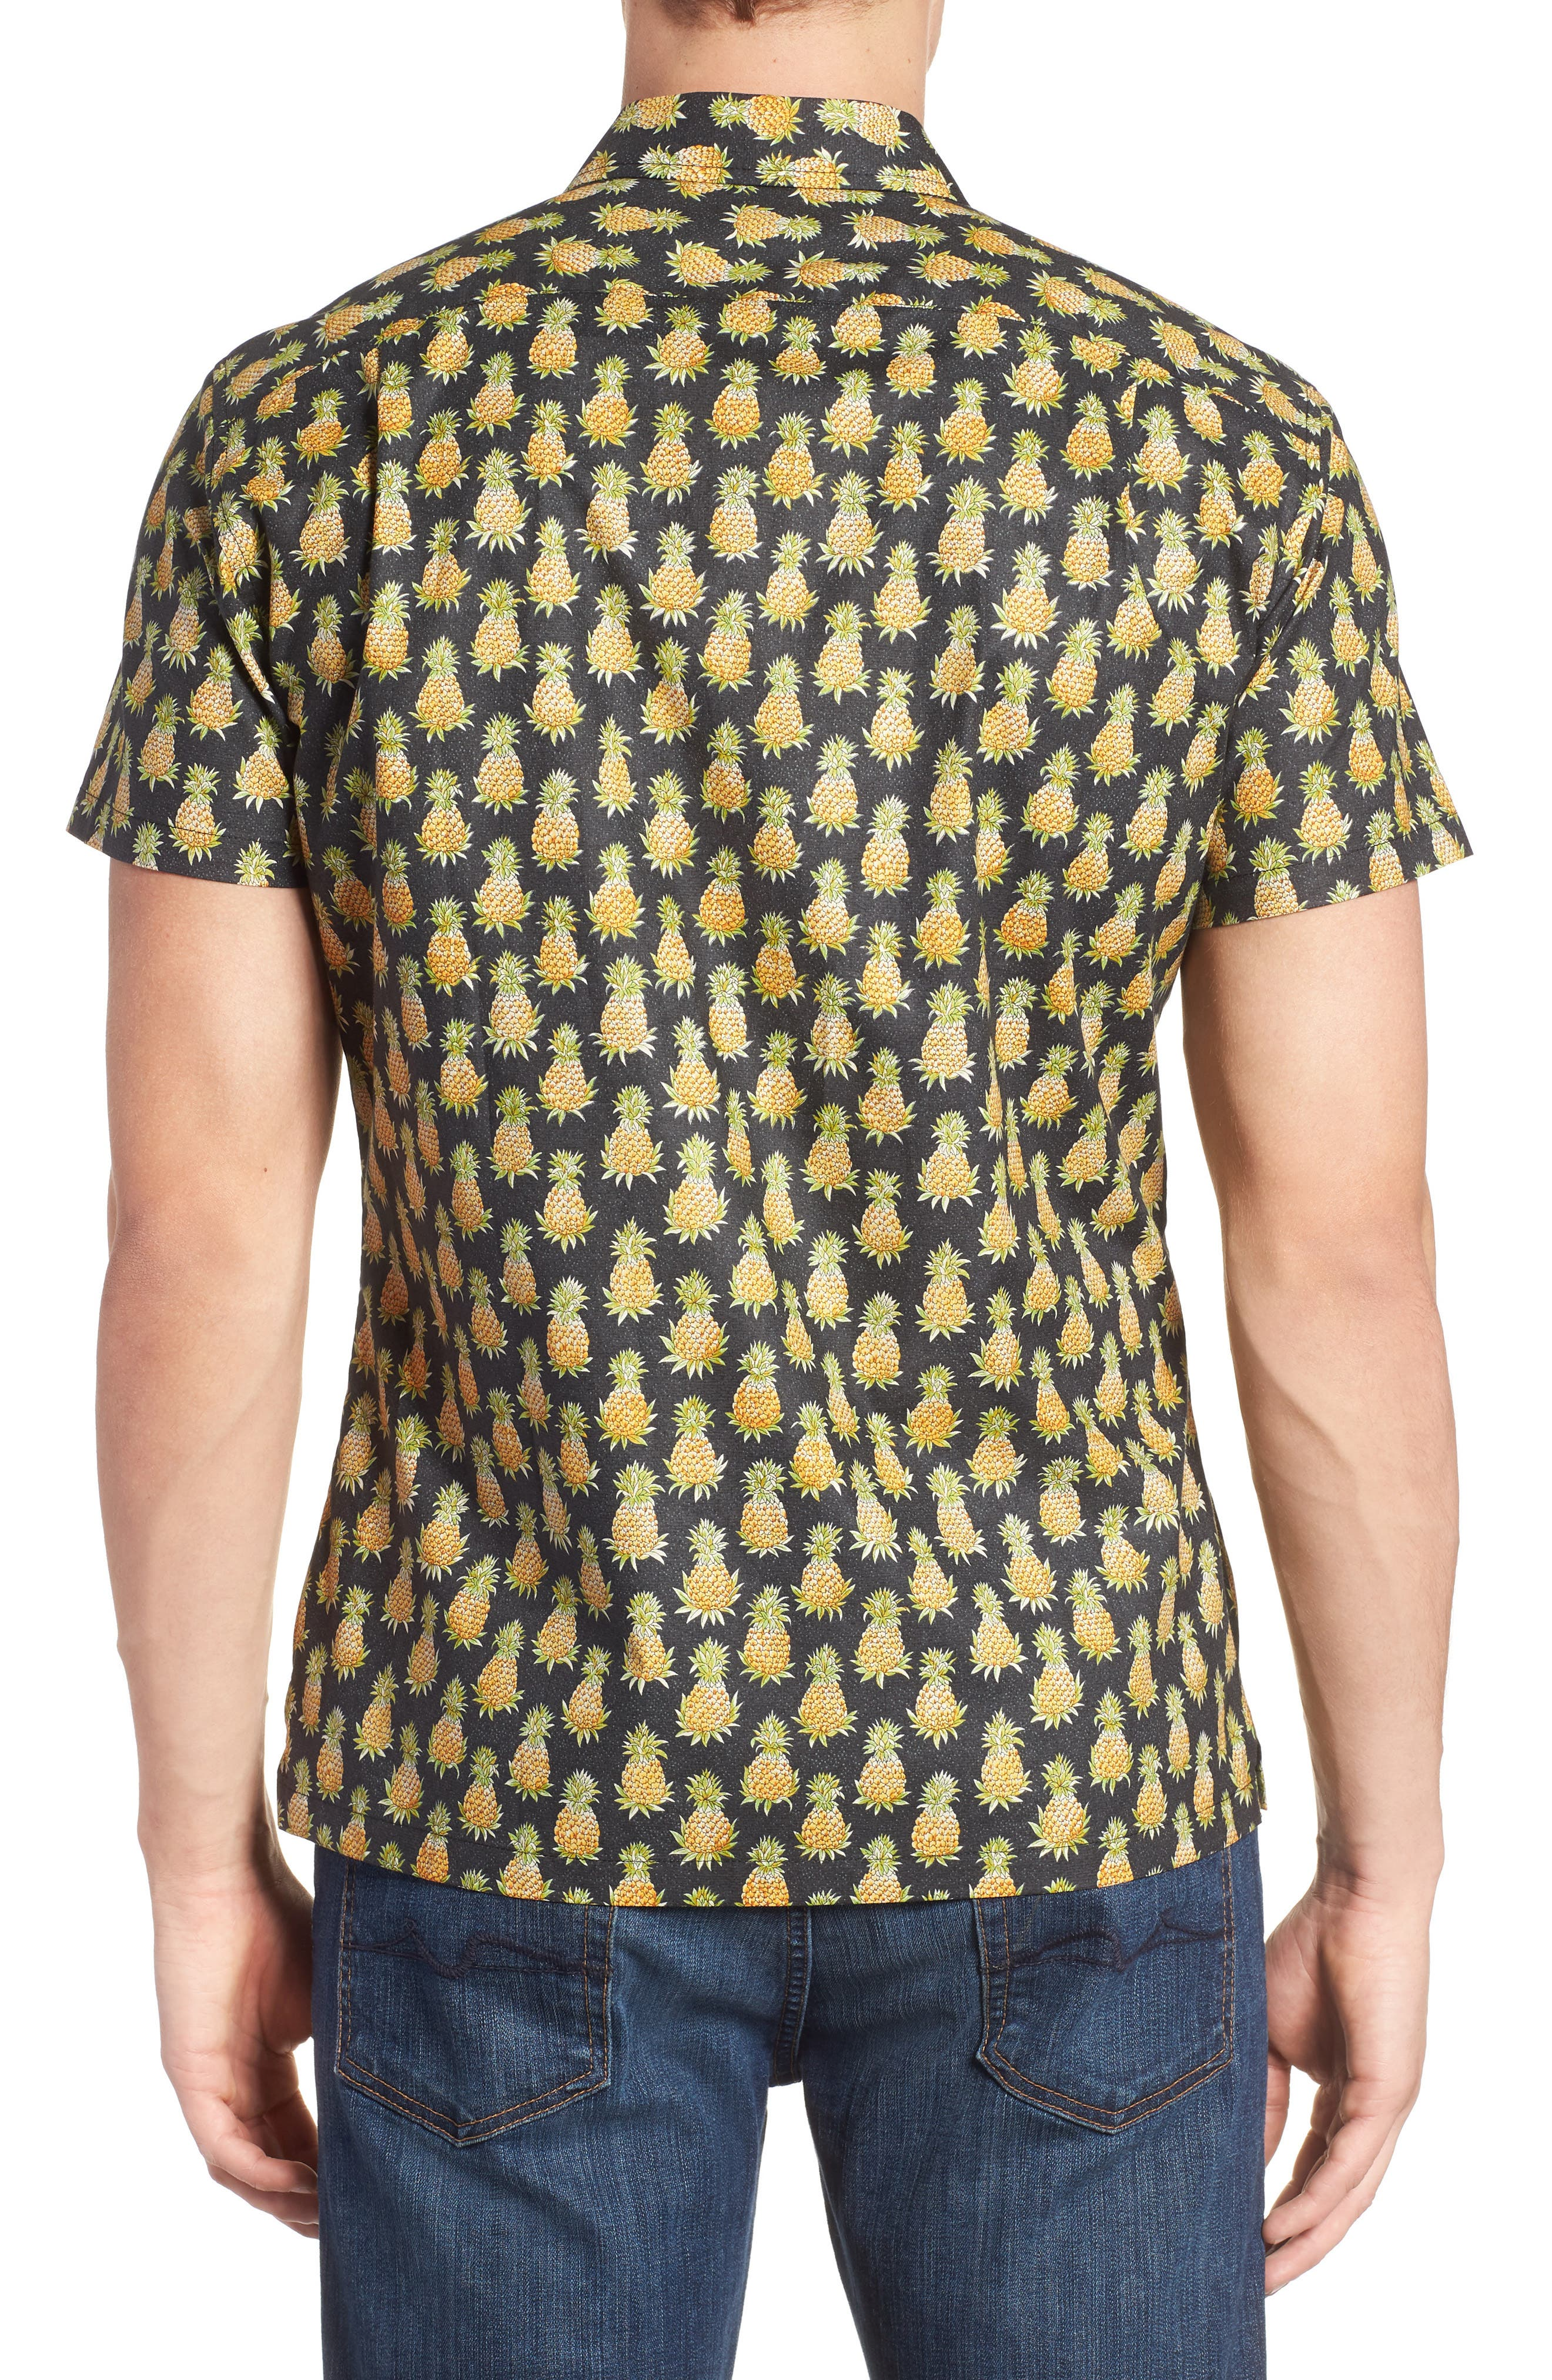 Pineaplism Trim Fit Camp Shirt,                             Alternate thumbnail 3, color,                             Black